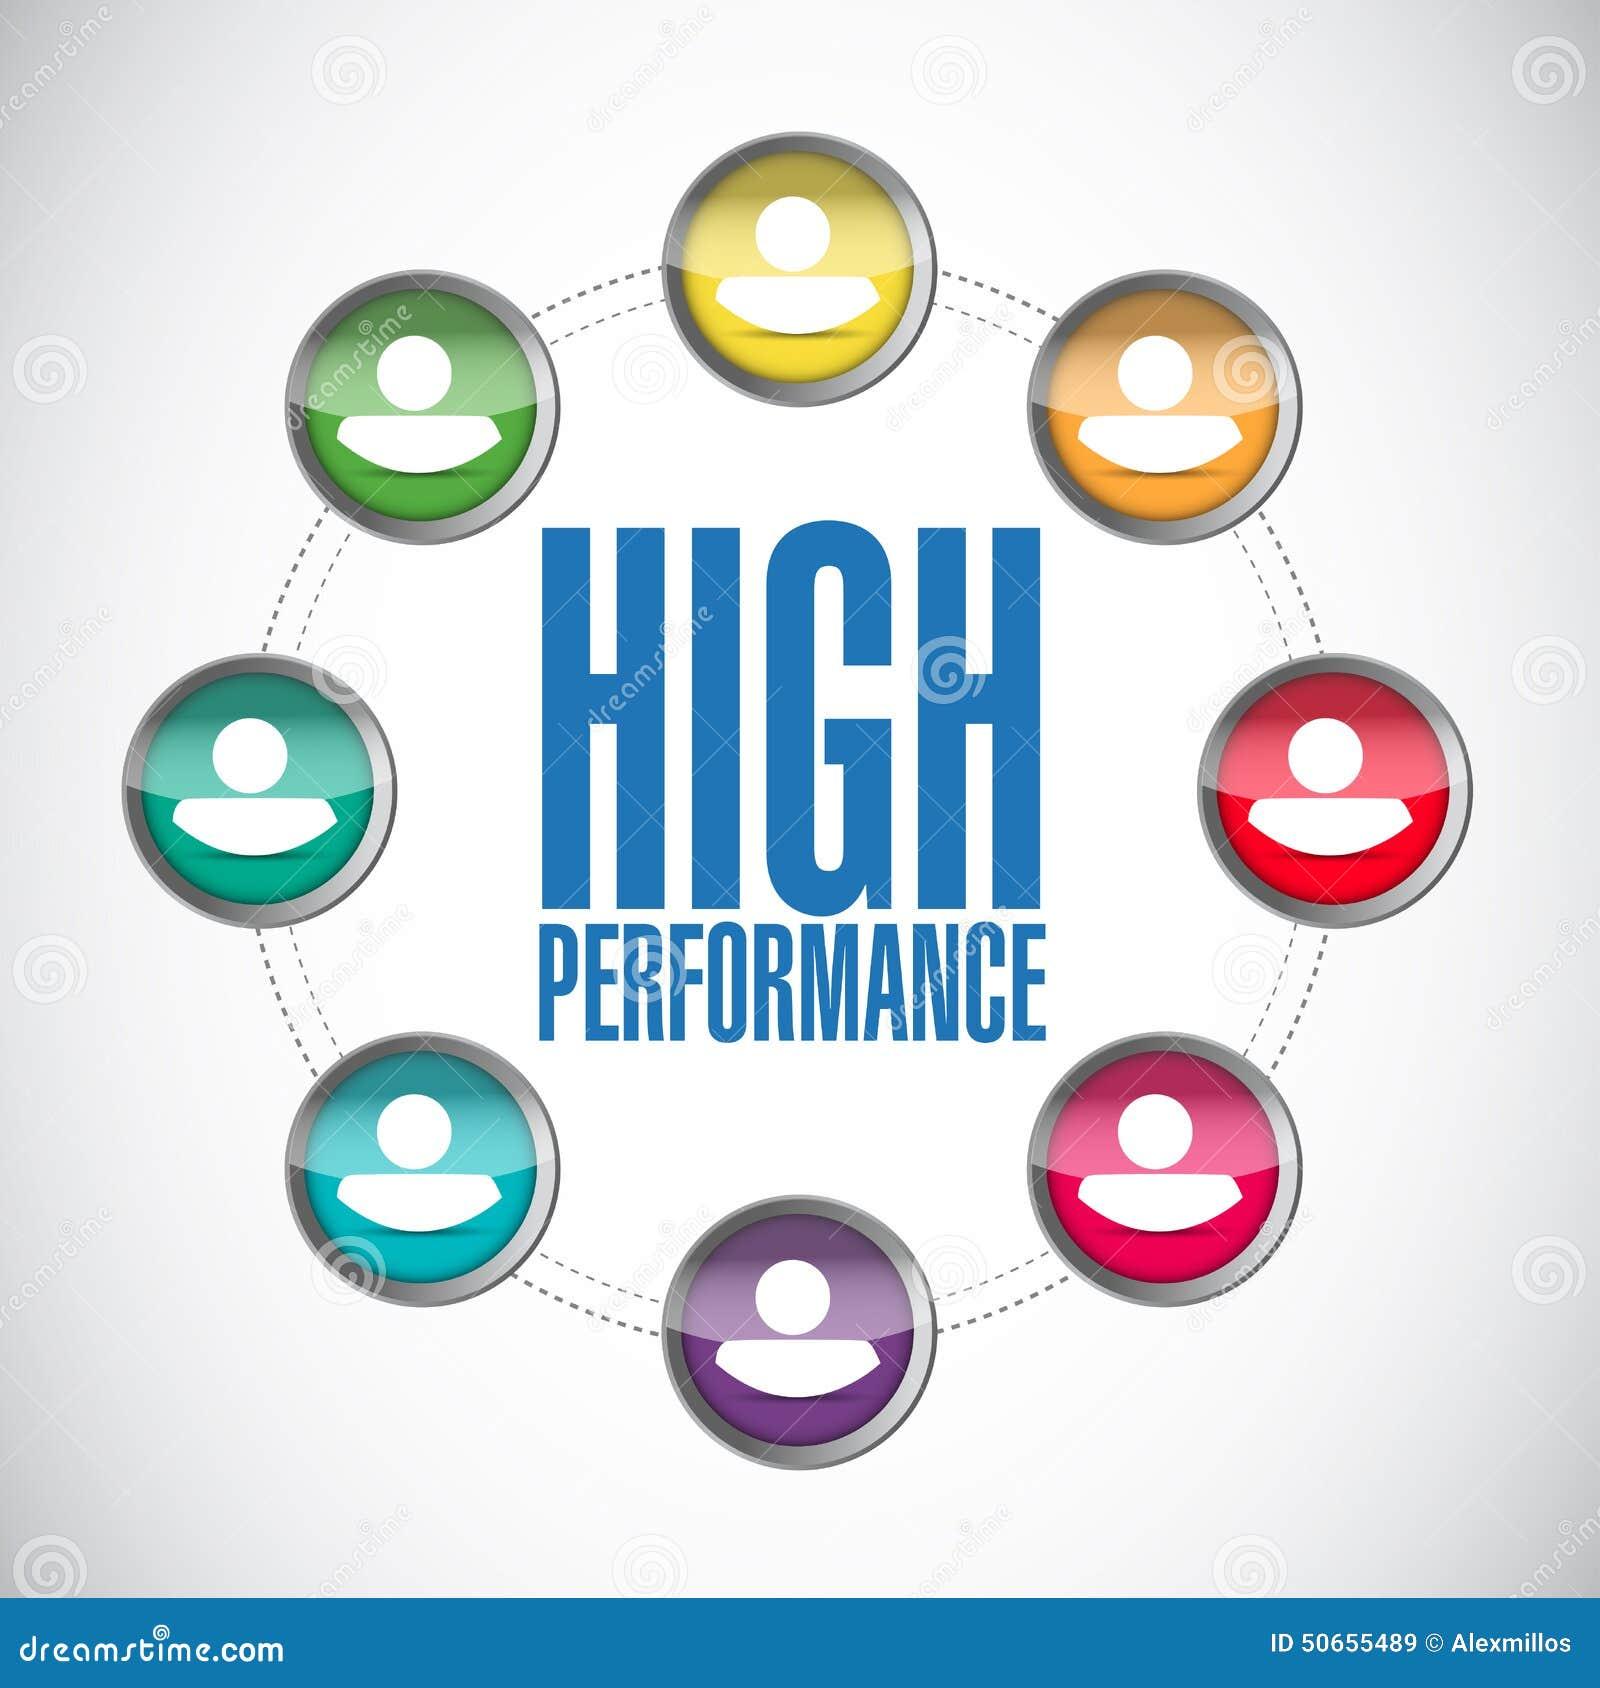 High Performance People Diagram Illustration Stock ...